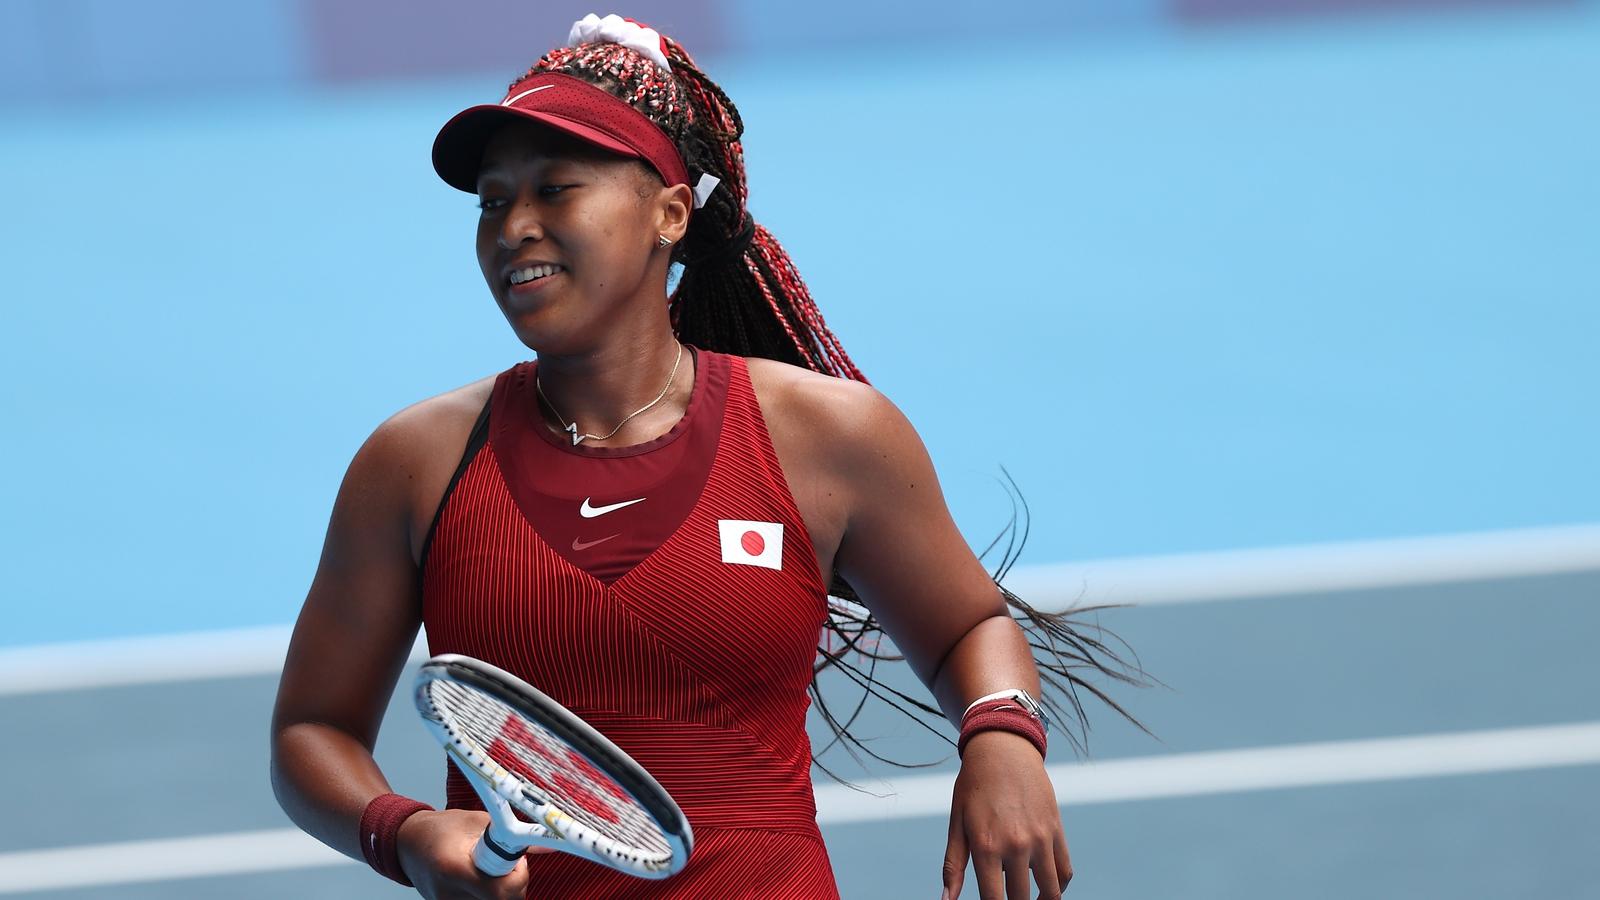 Osaka hints her return to tennis may be close